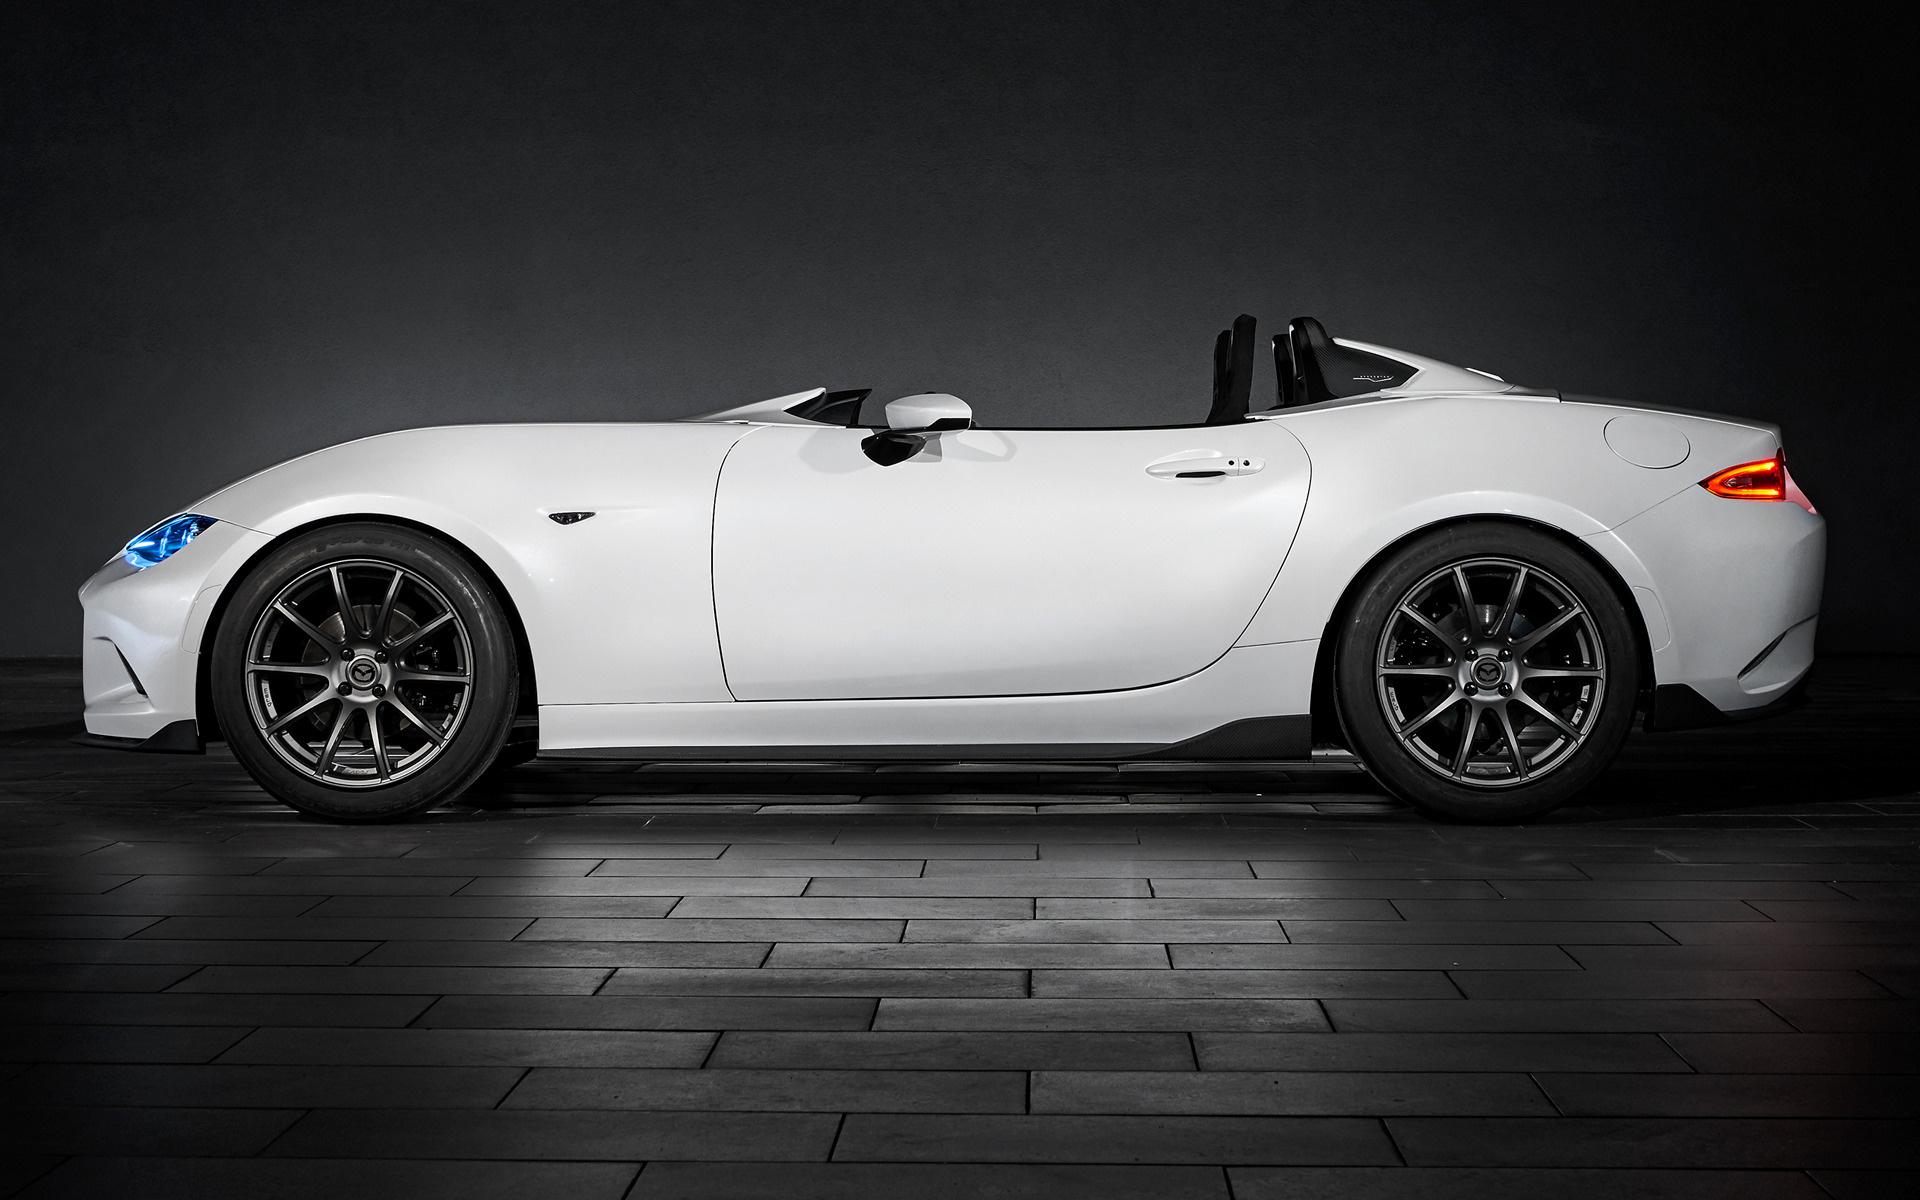 https://www.carpixel.net/w/323dd955e412722fce7e17bd16057937/mazda-mx-5-speedster-evolution-concept-car-wallpaper-58458.jpg